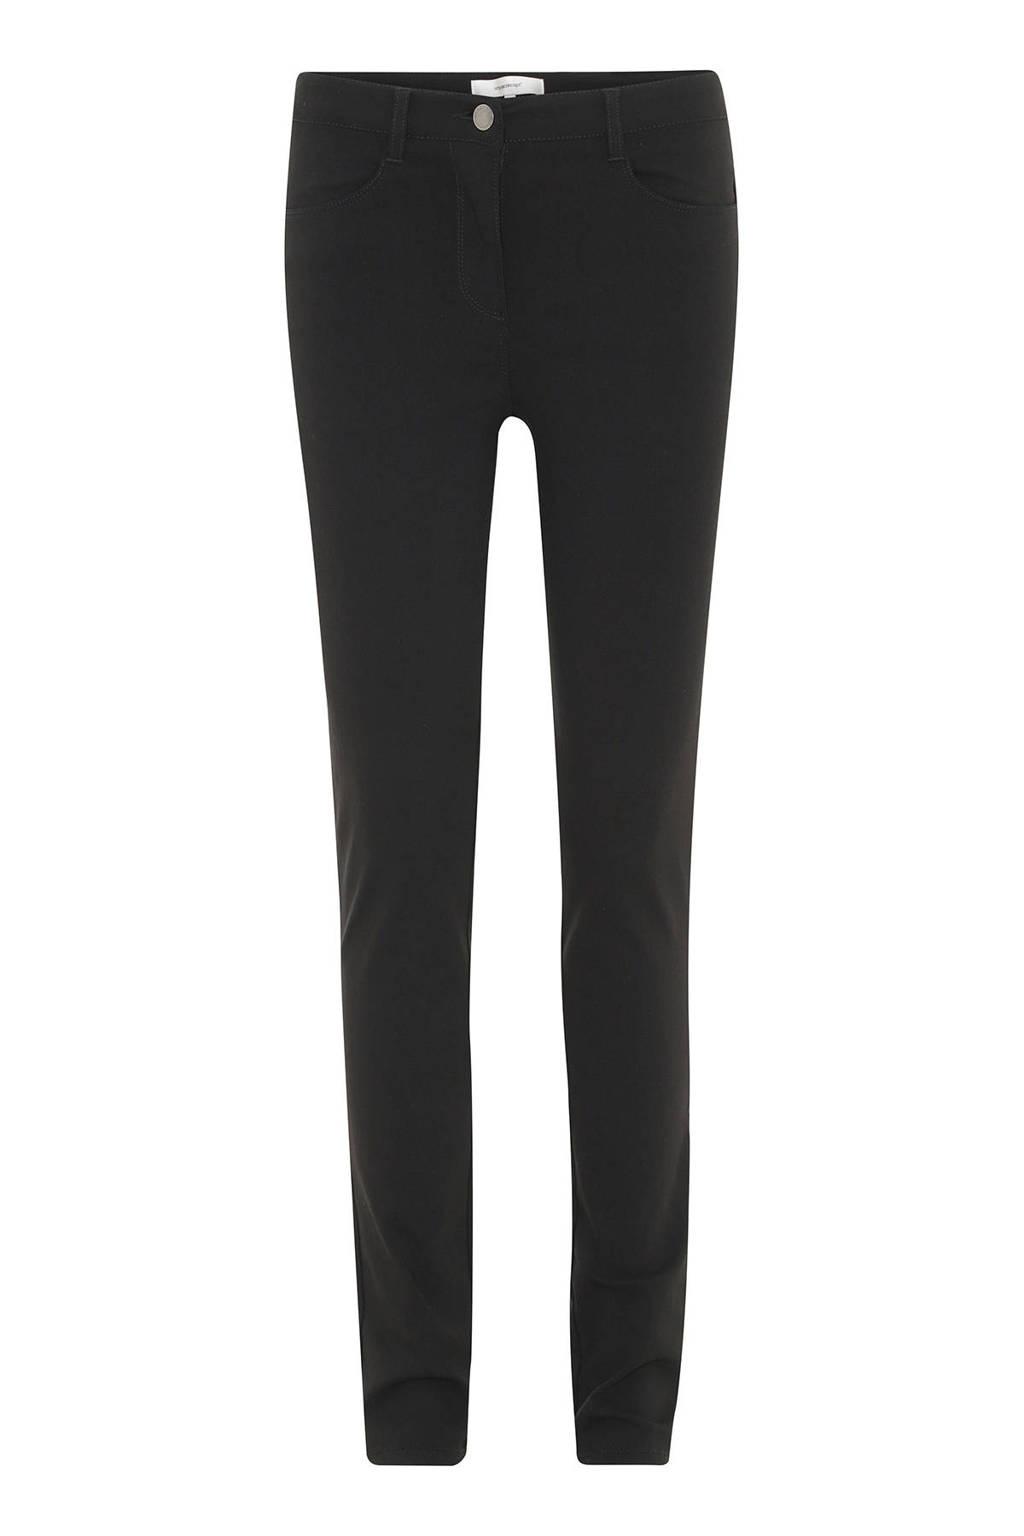 Soyaconcept skinny broek zwart, Zwart